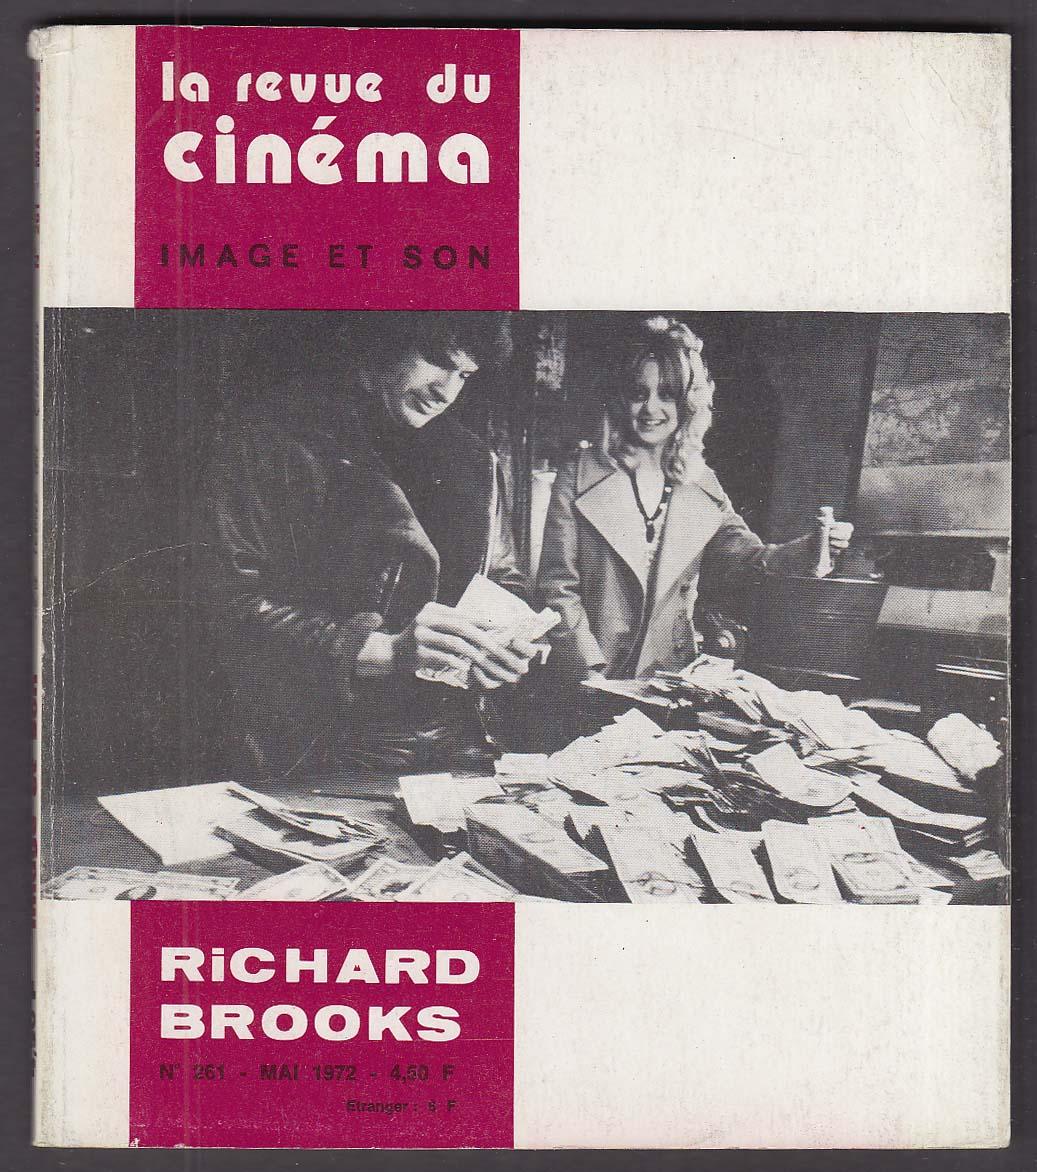 LA REVUE DU CINEMA Richard Brooks Goldie Hawn Warren Beatty $ Dollars 5 1972